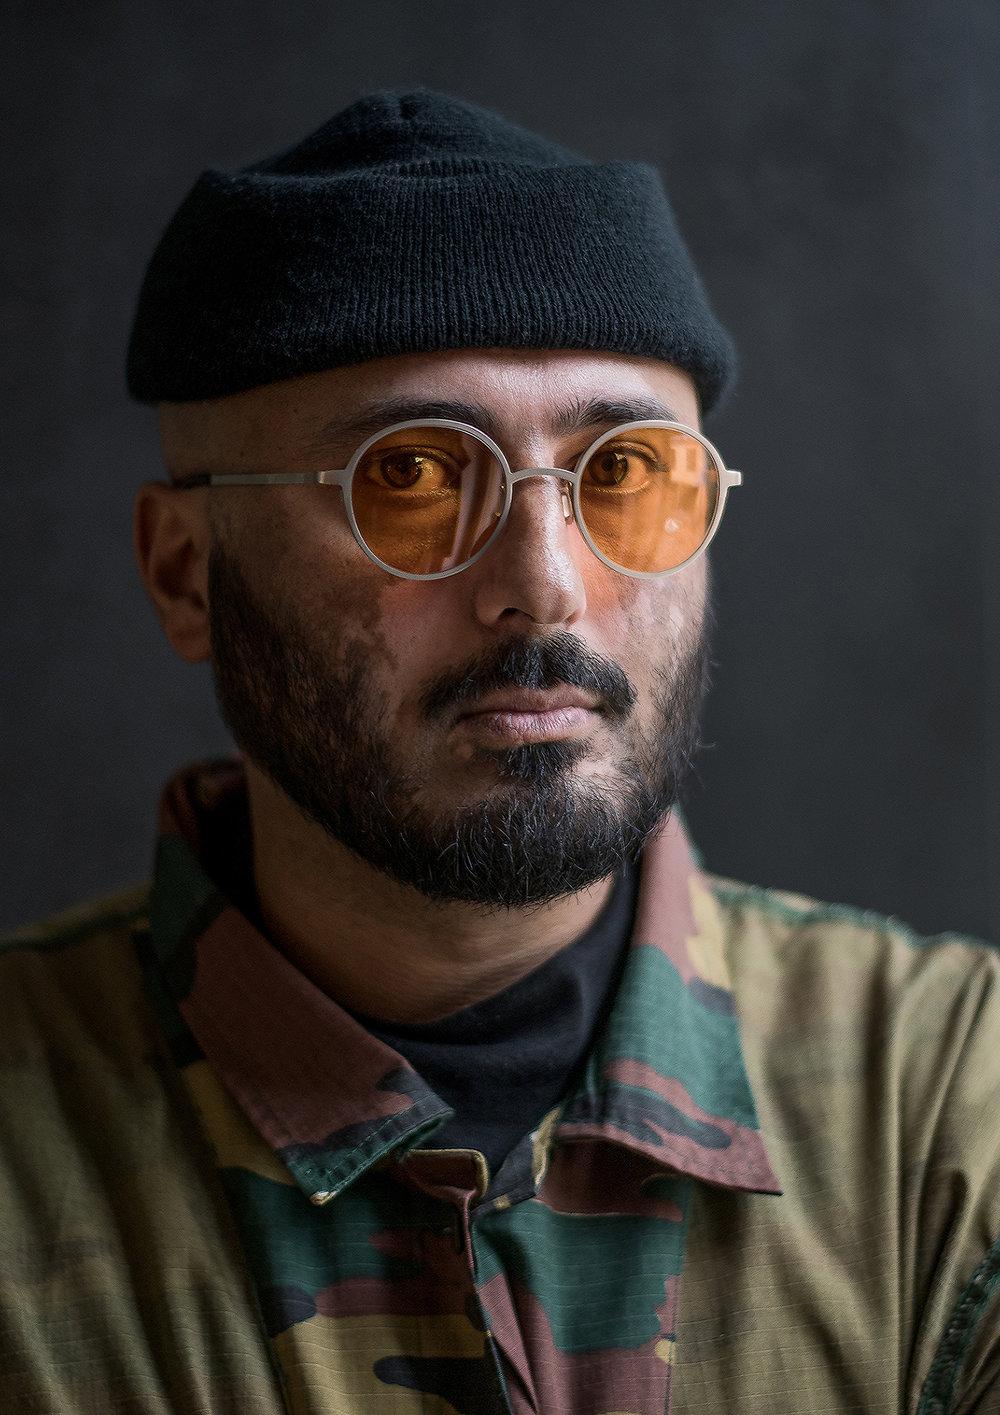 Reza Etamadi (MUF10) for Soundvenue